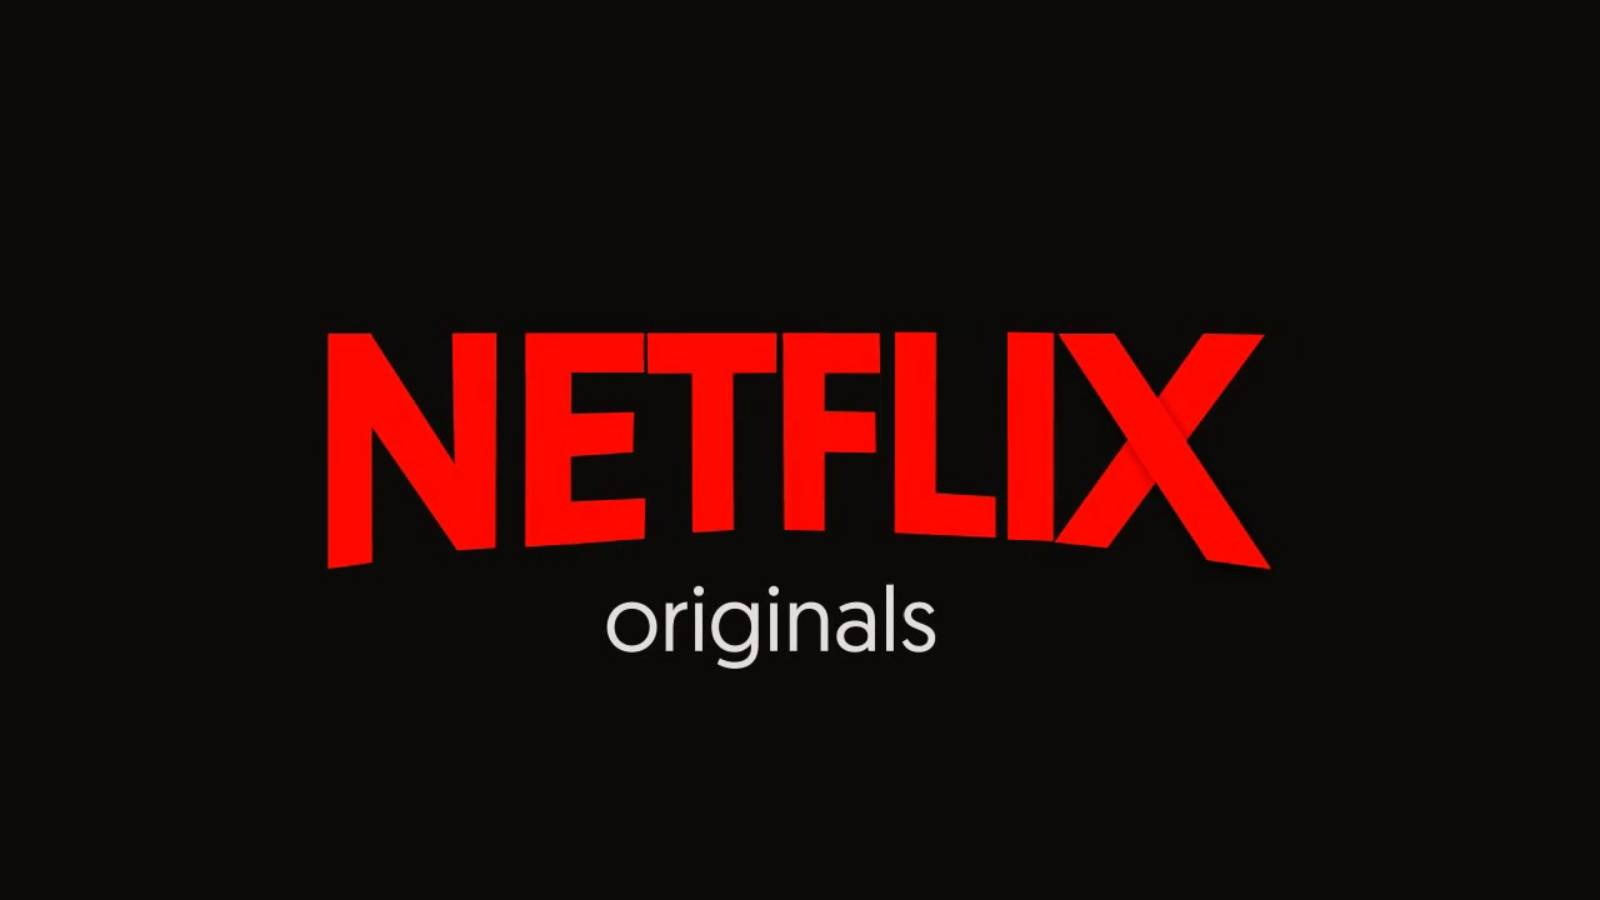 Netflix broadcom